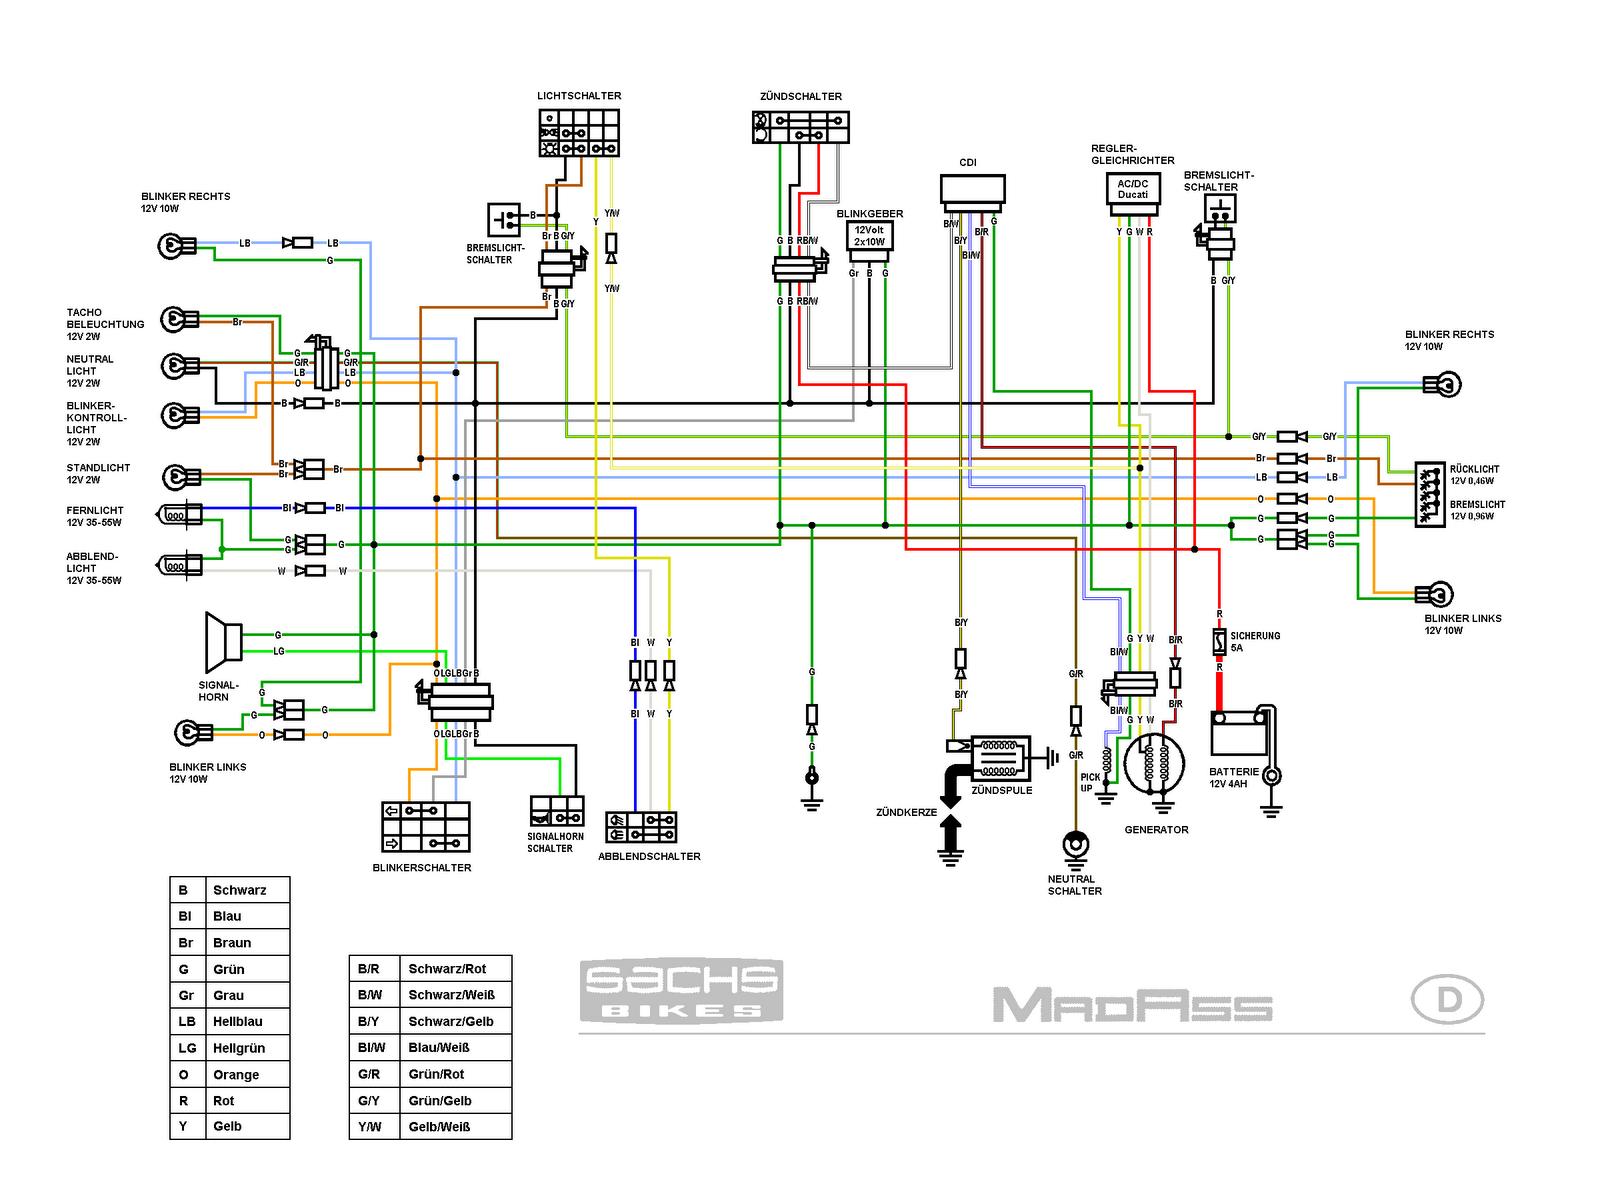 Engine wiring diagram yamaha mio thebuffalotruck